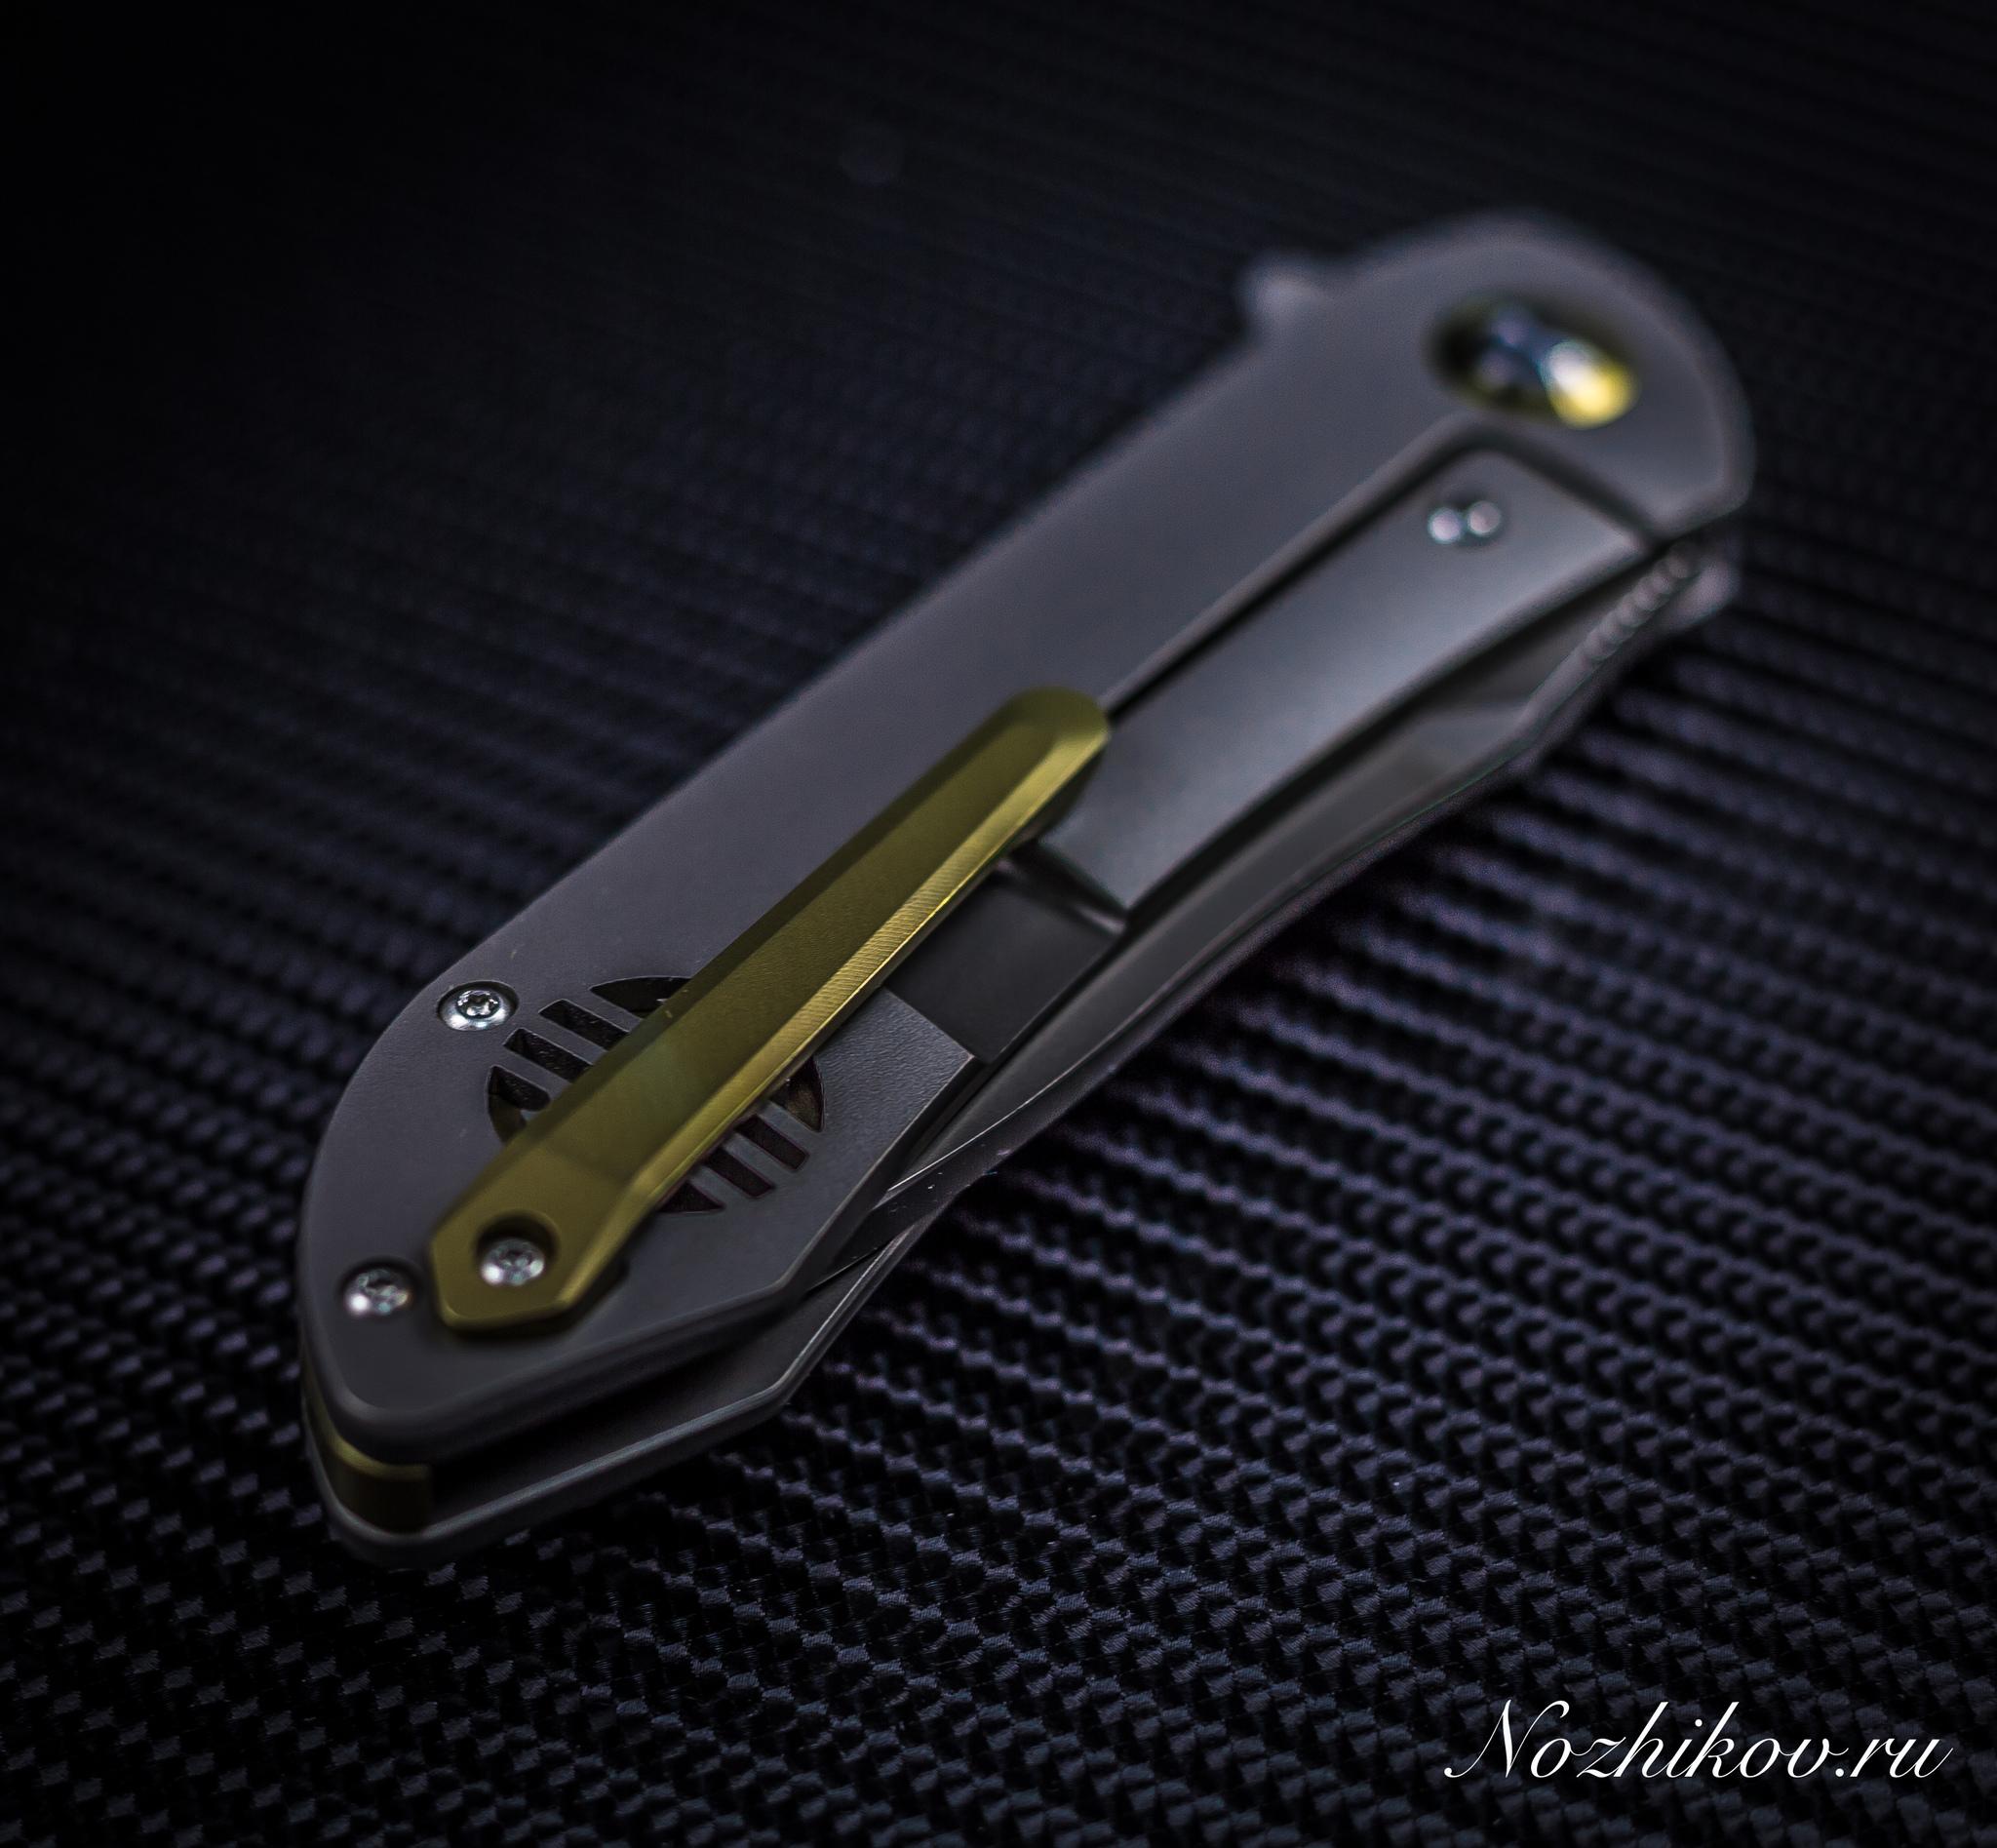 Фото 8 - Складной нож Bestech Knives BT1703A, сталь CPM-S35VN, рукоять титан